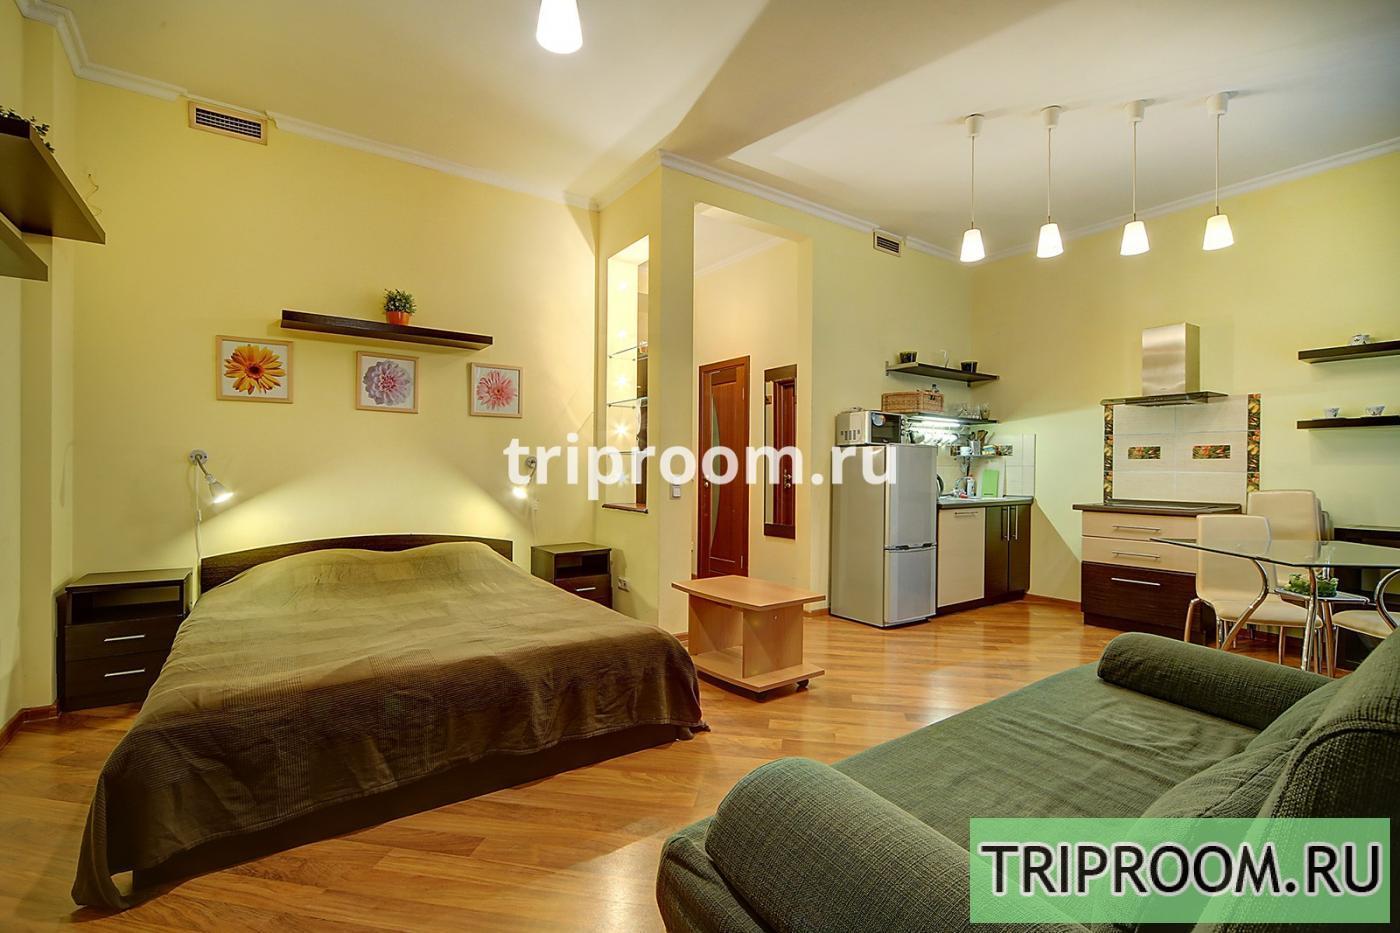 1-комнатная квартира посуточно (вариант № 15117), ул. Канала Грибоедова набережная, фото № 1